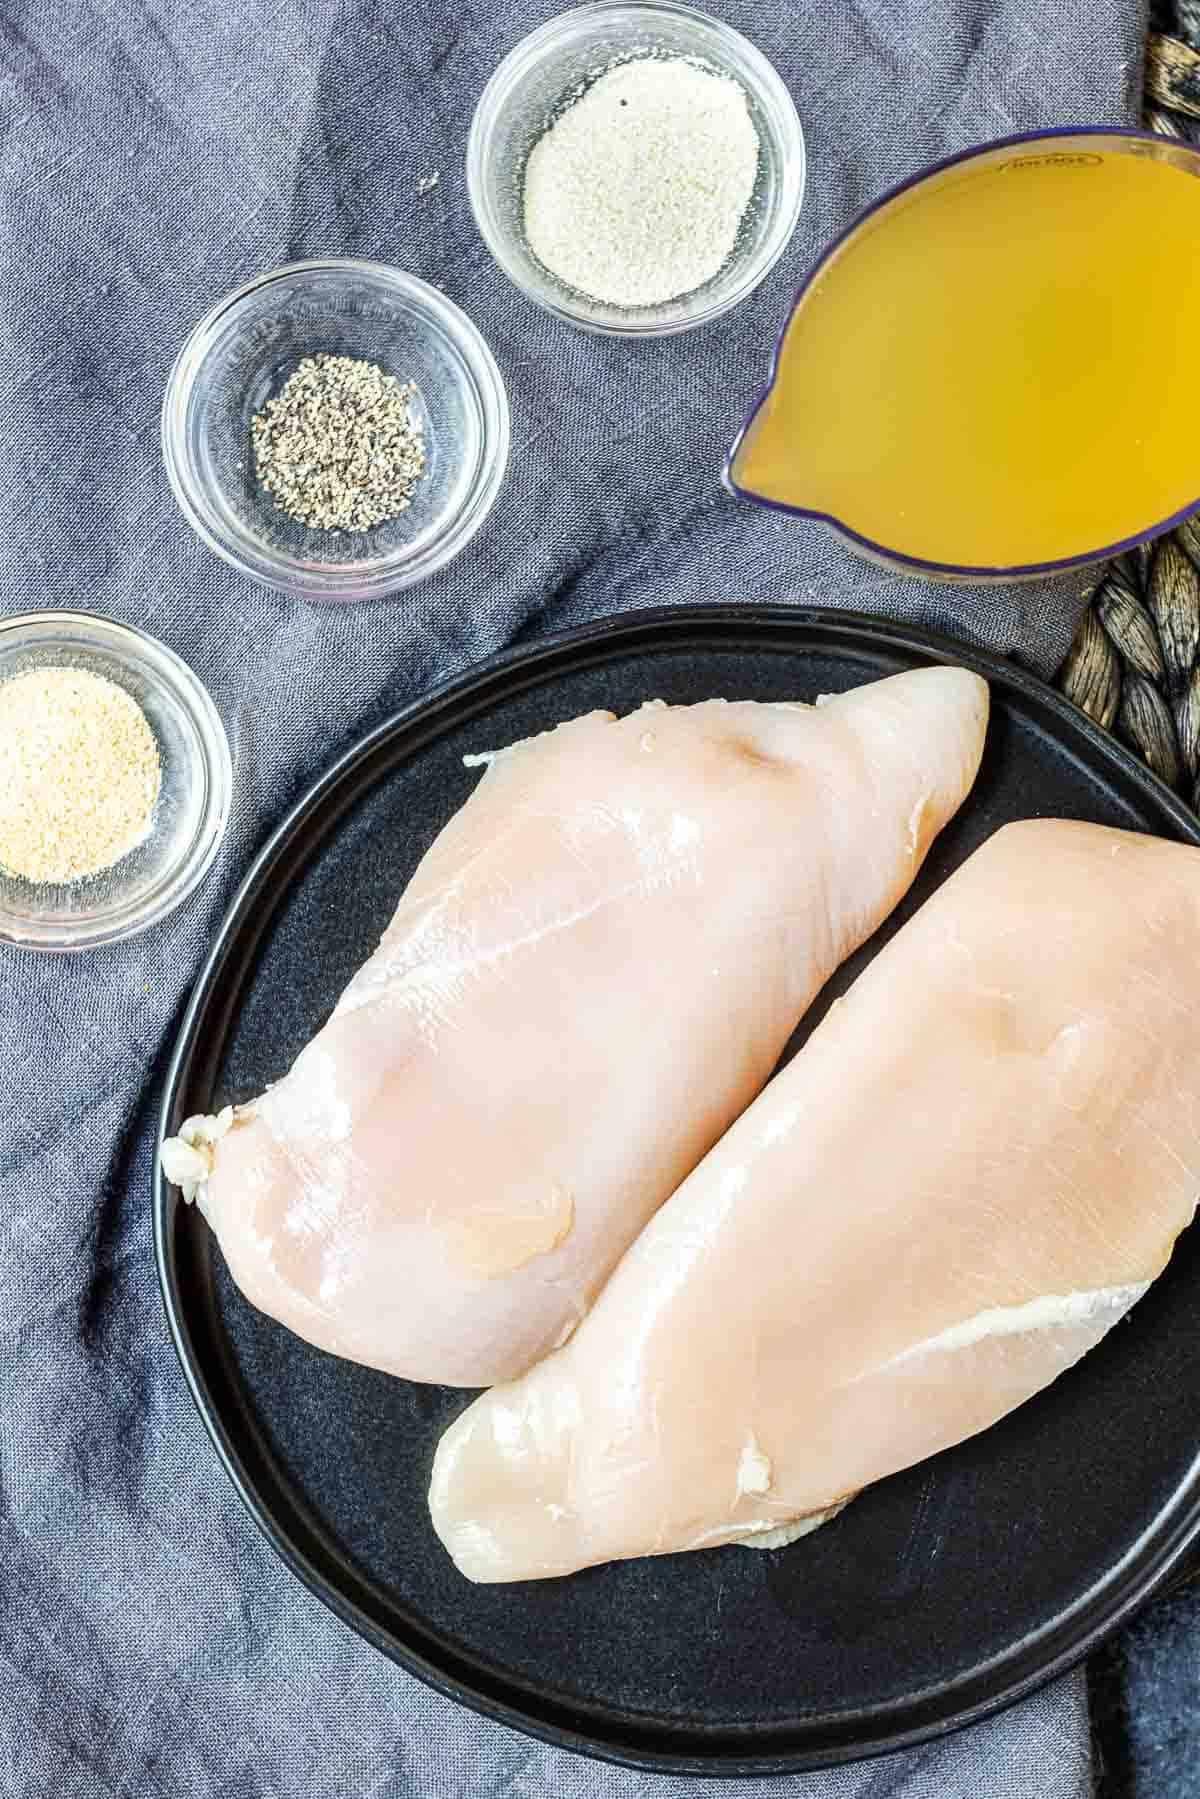 ingredients for make Instant Pot Shredded Chicken